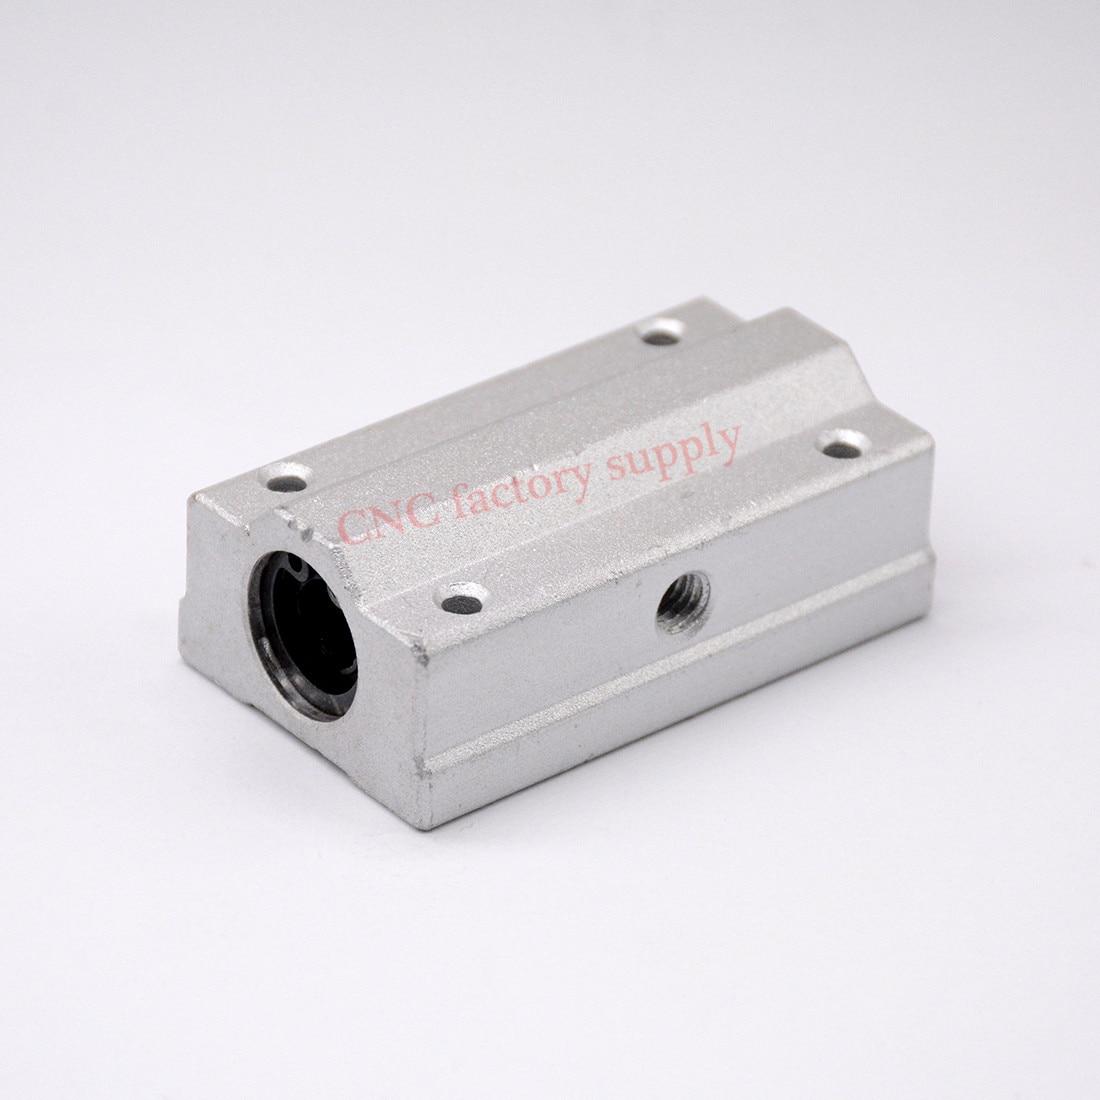 все цены на  Free shipping SC25LUU SCS25LUU 25mm long type Linear Ball Bearing Block CNC Router  онлайн